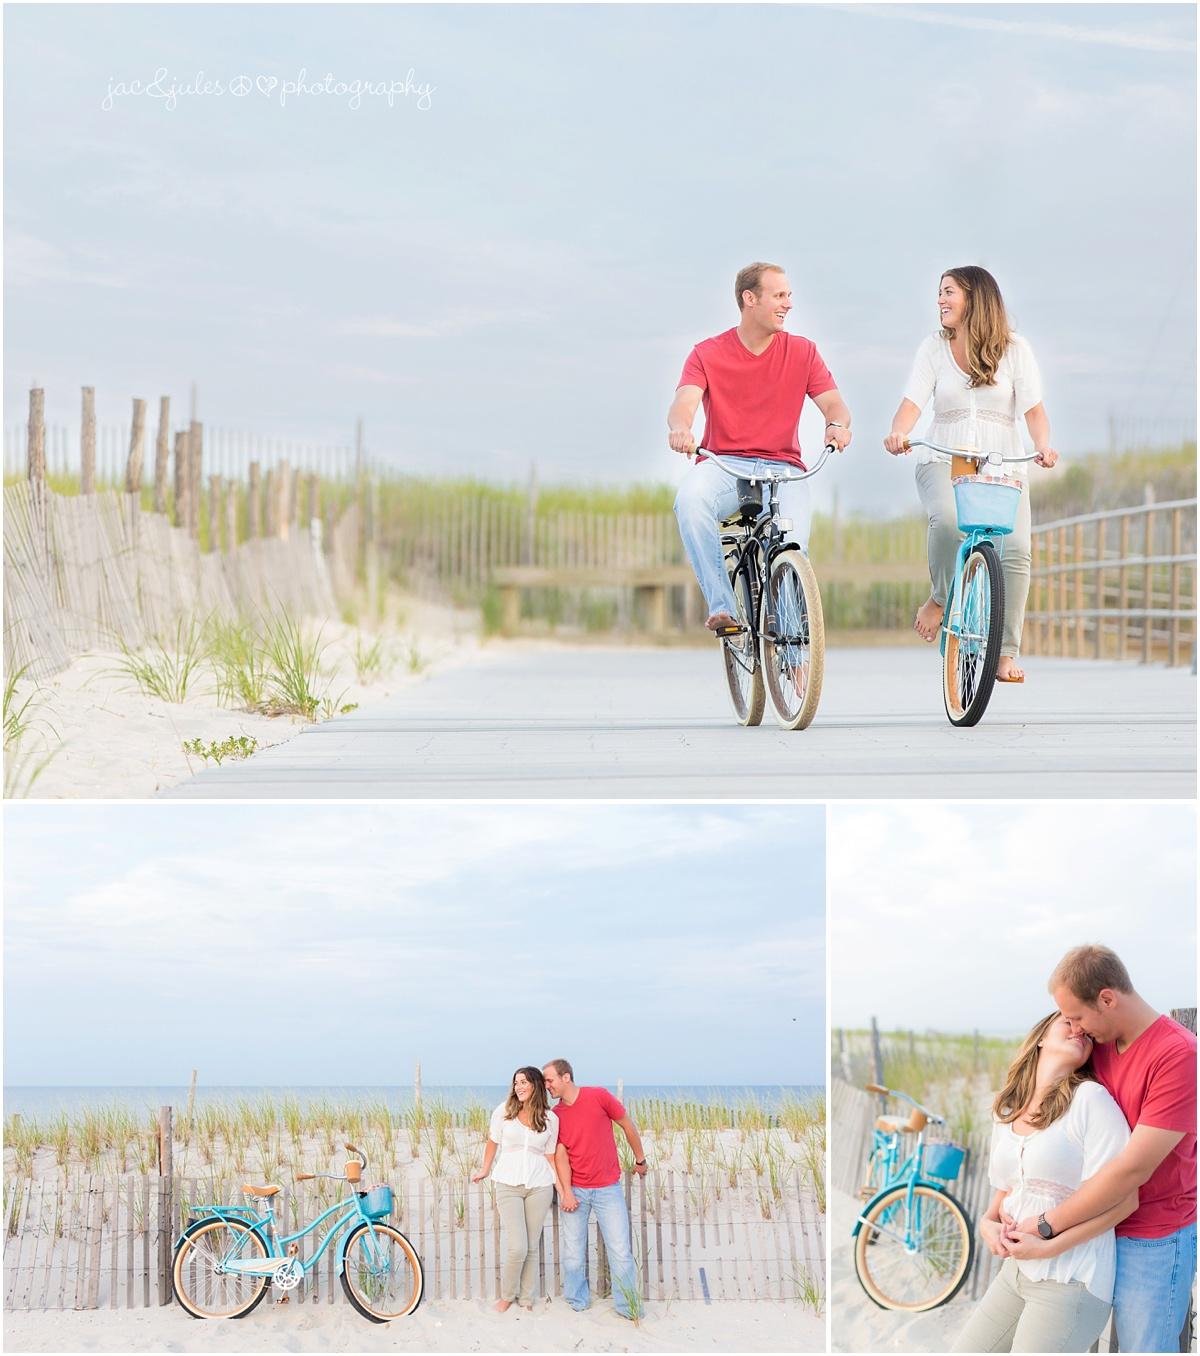 engaged couple having fun on their beach cruiser bikes